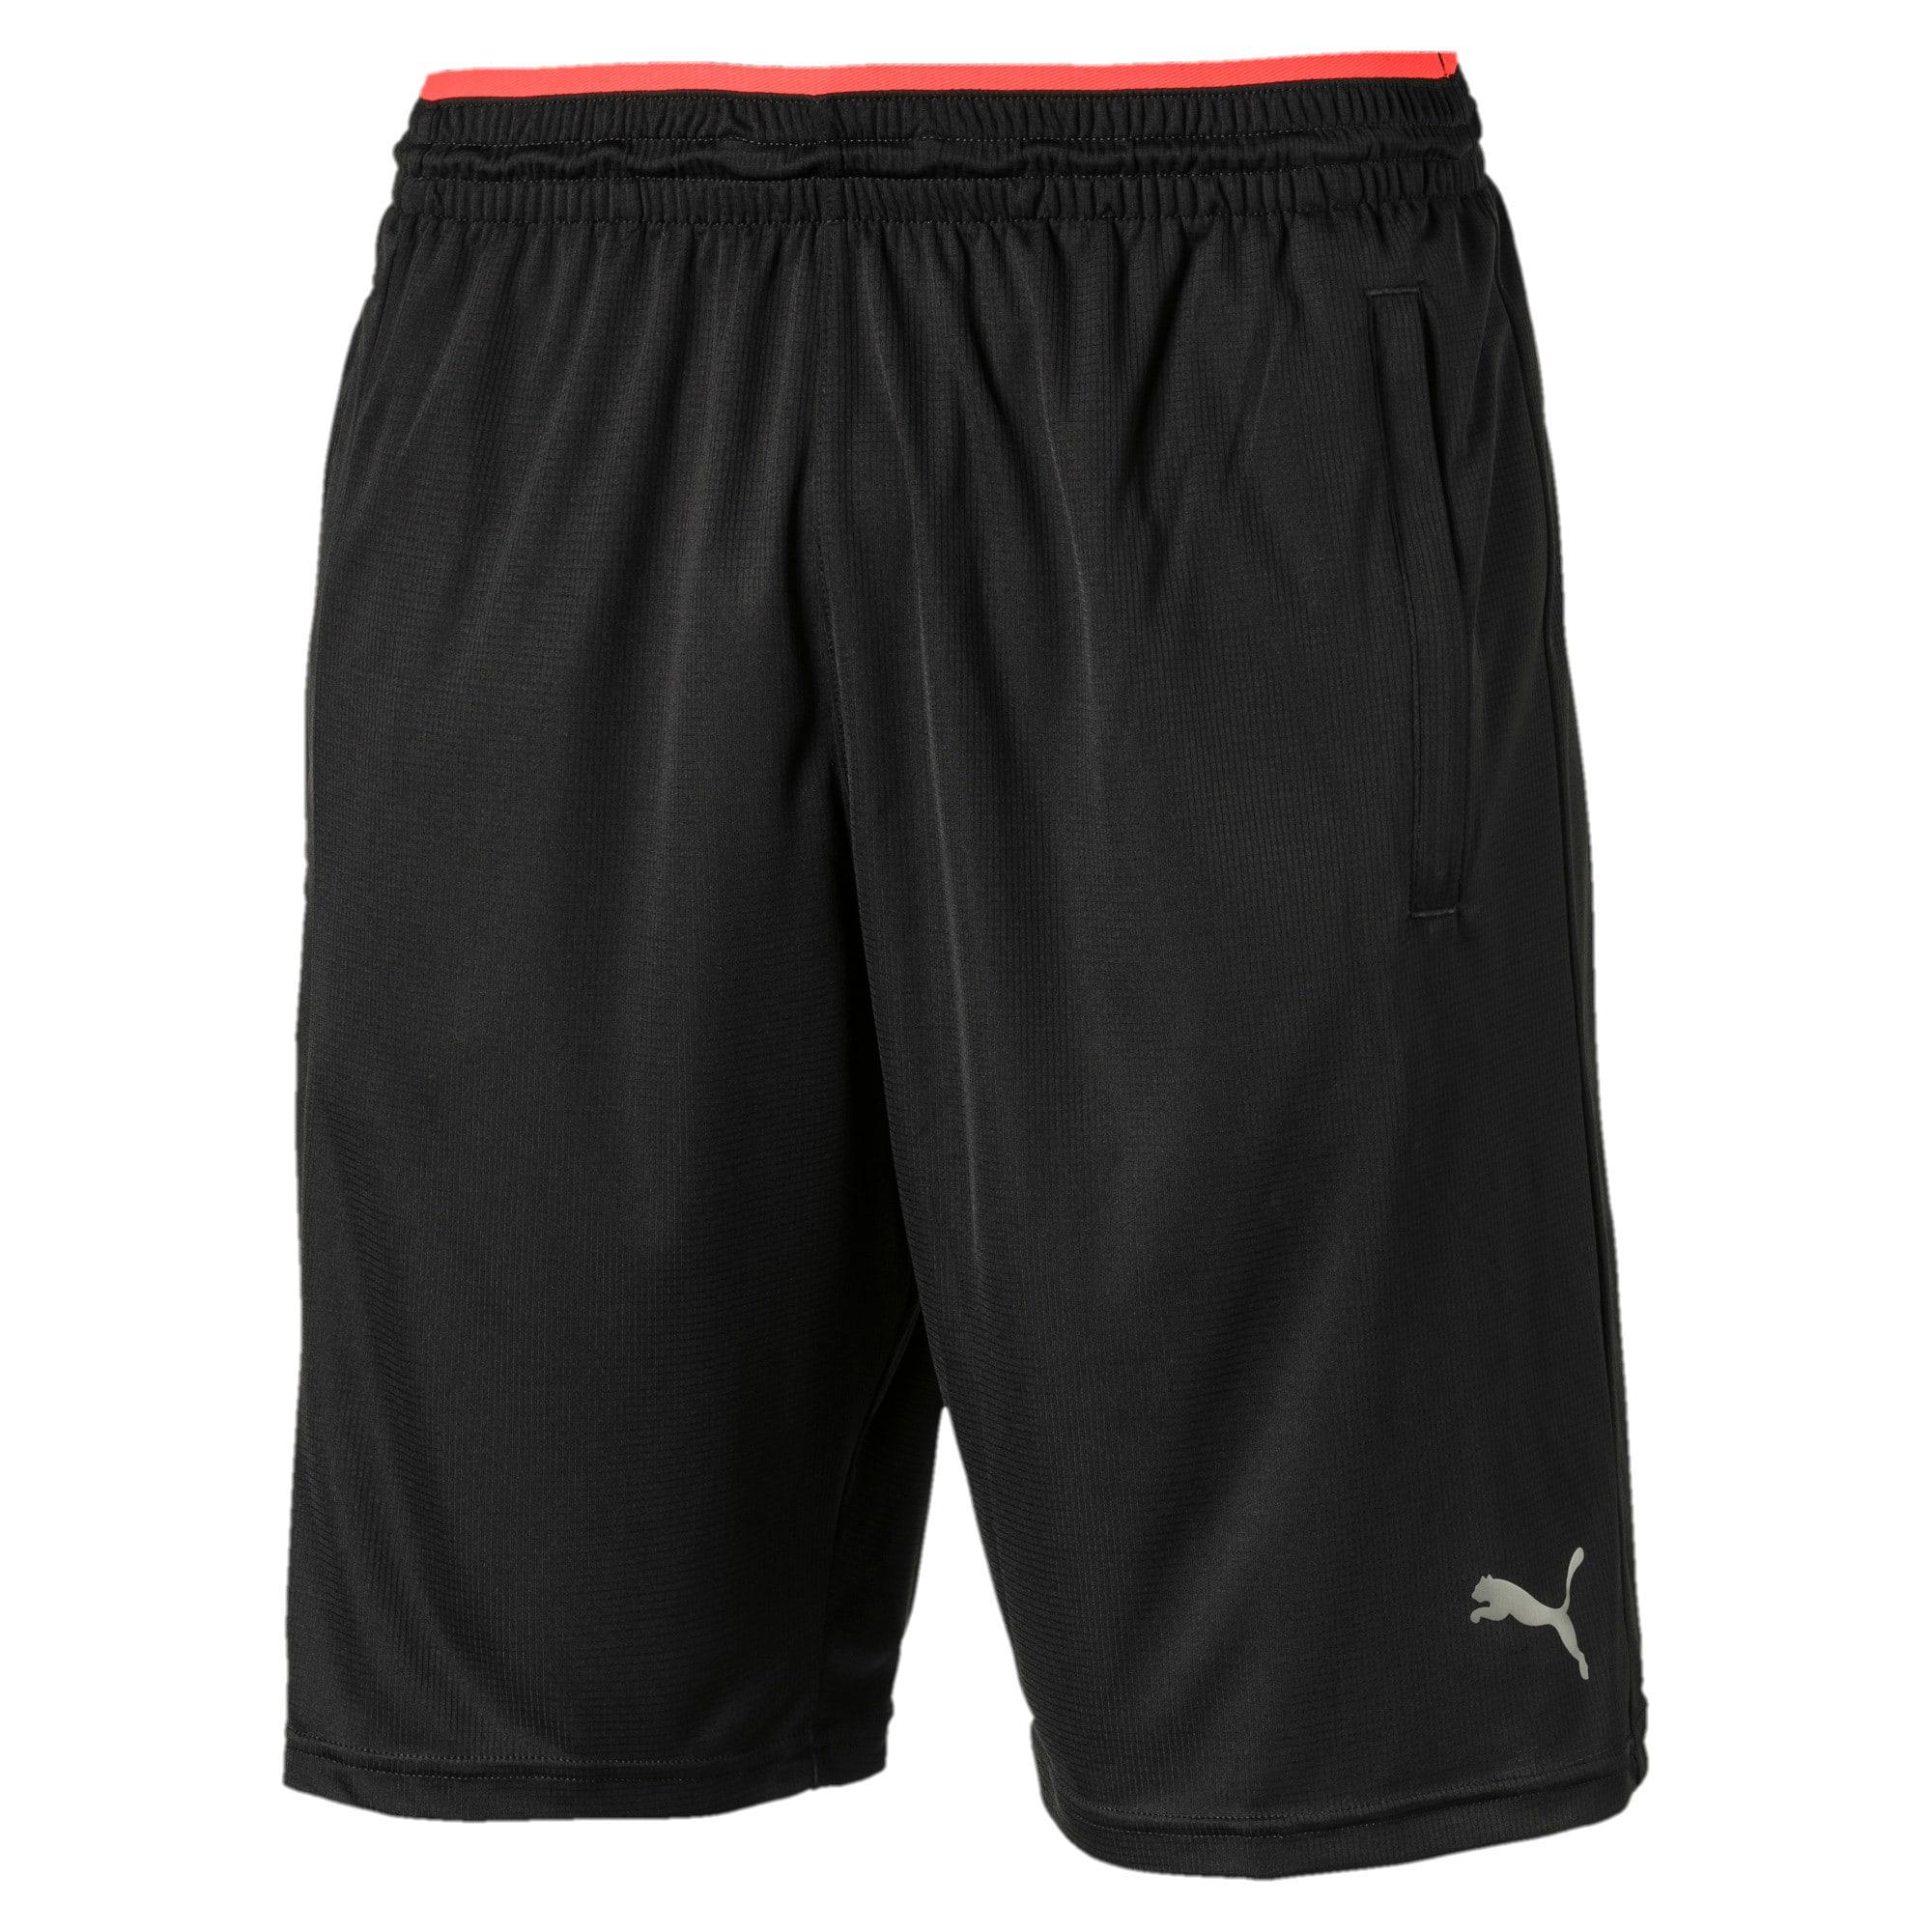 Thumbnail 4 of Collective Men's Knit Shorts, Puma Black-Nrgy Red, medium